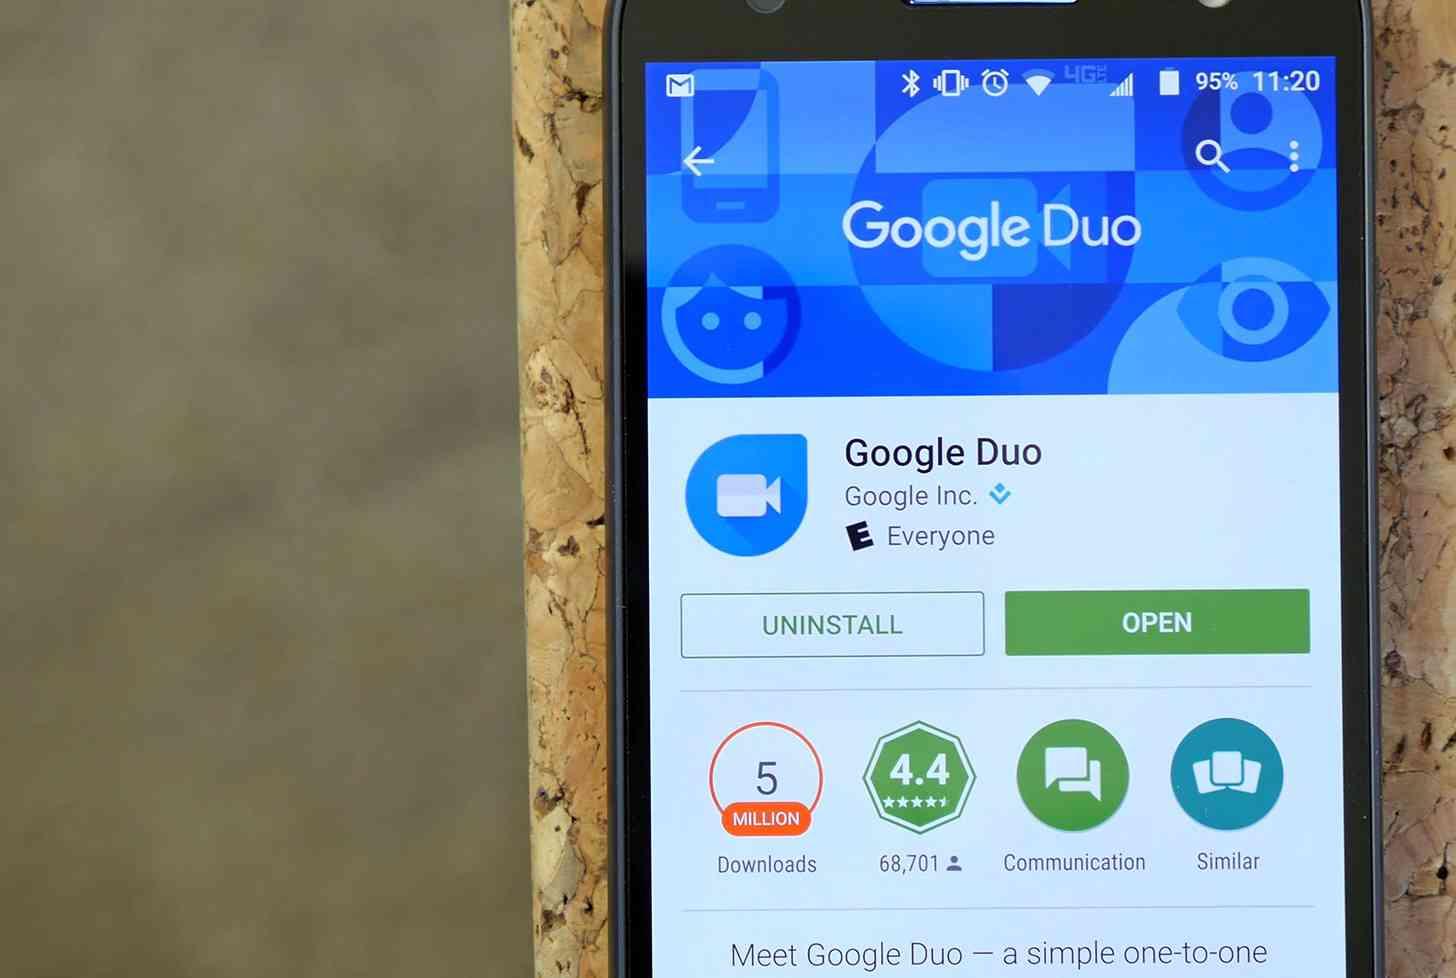 Google Duo app